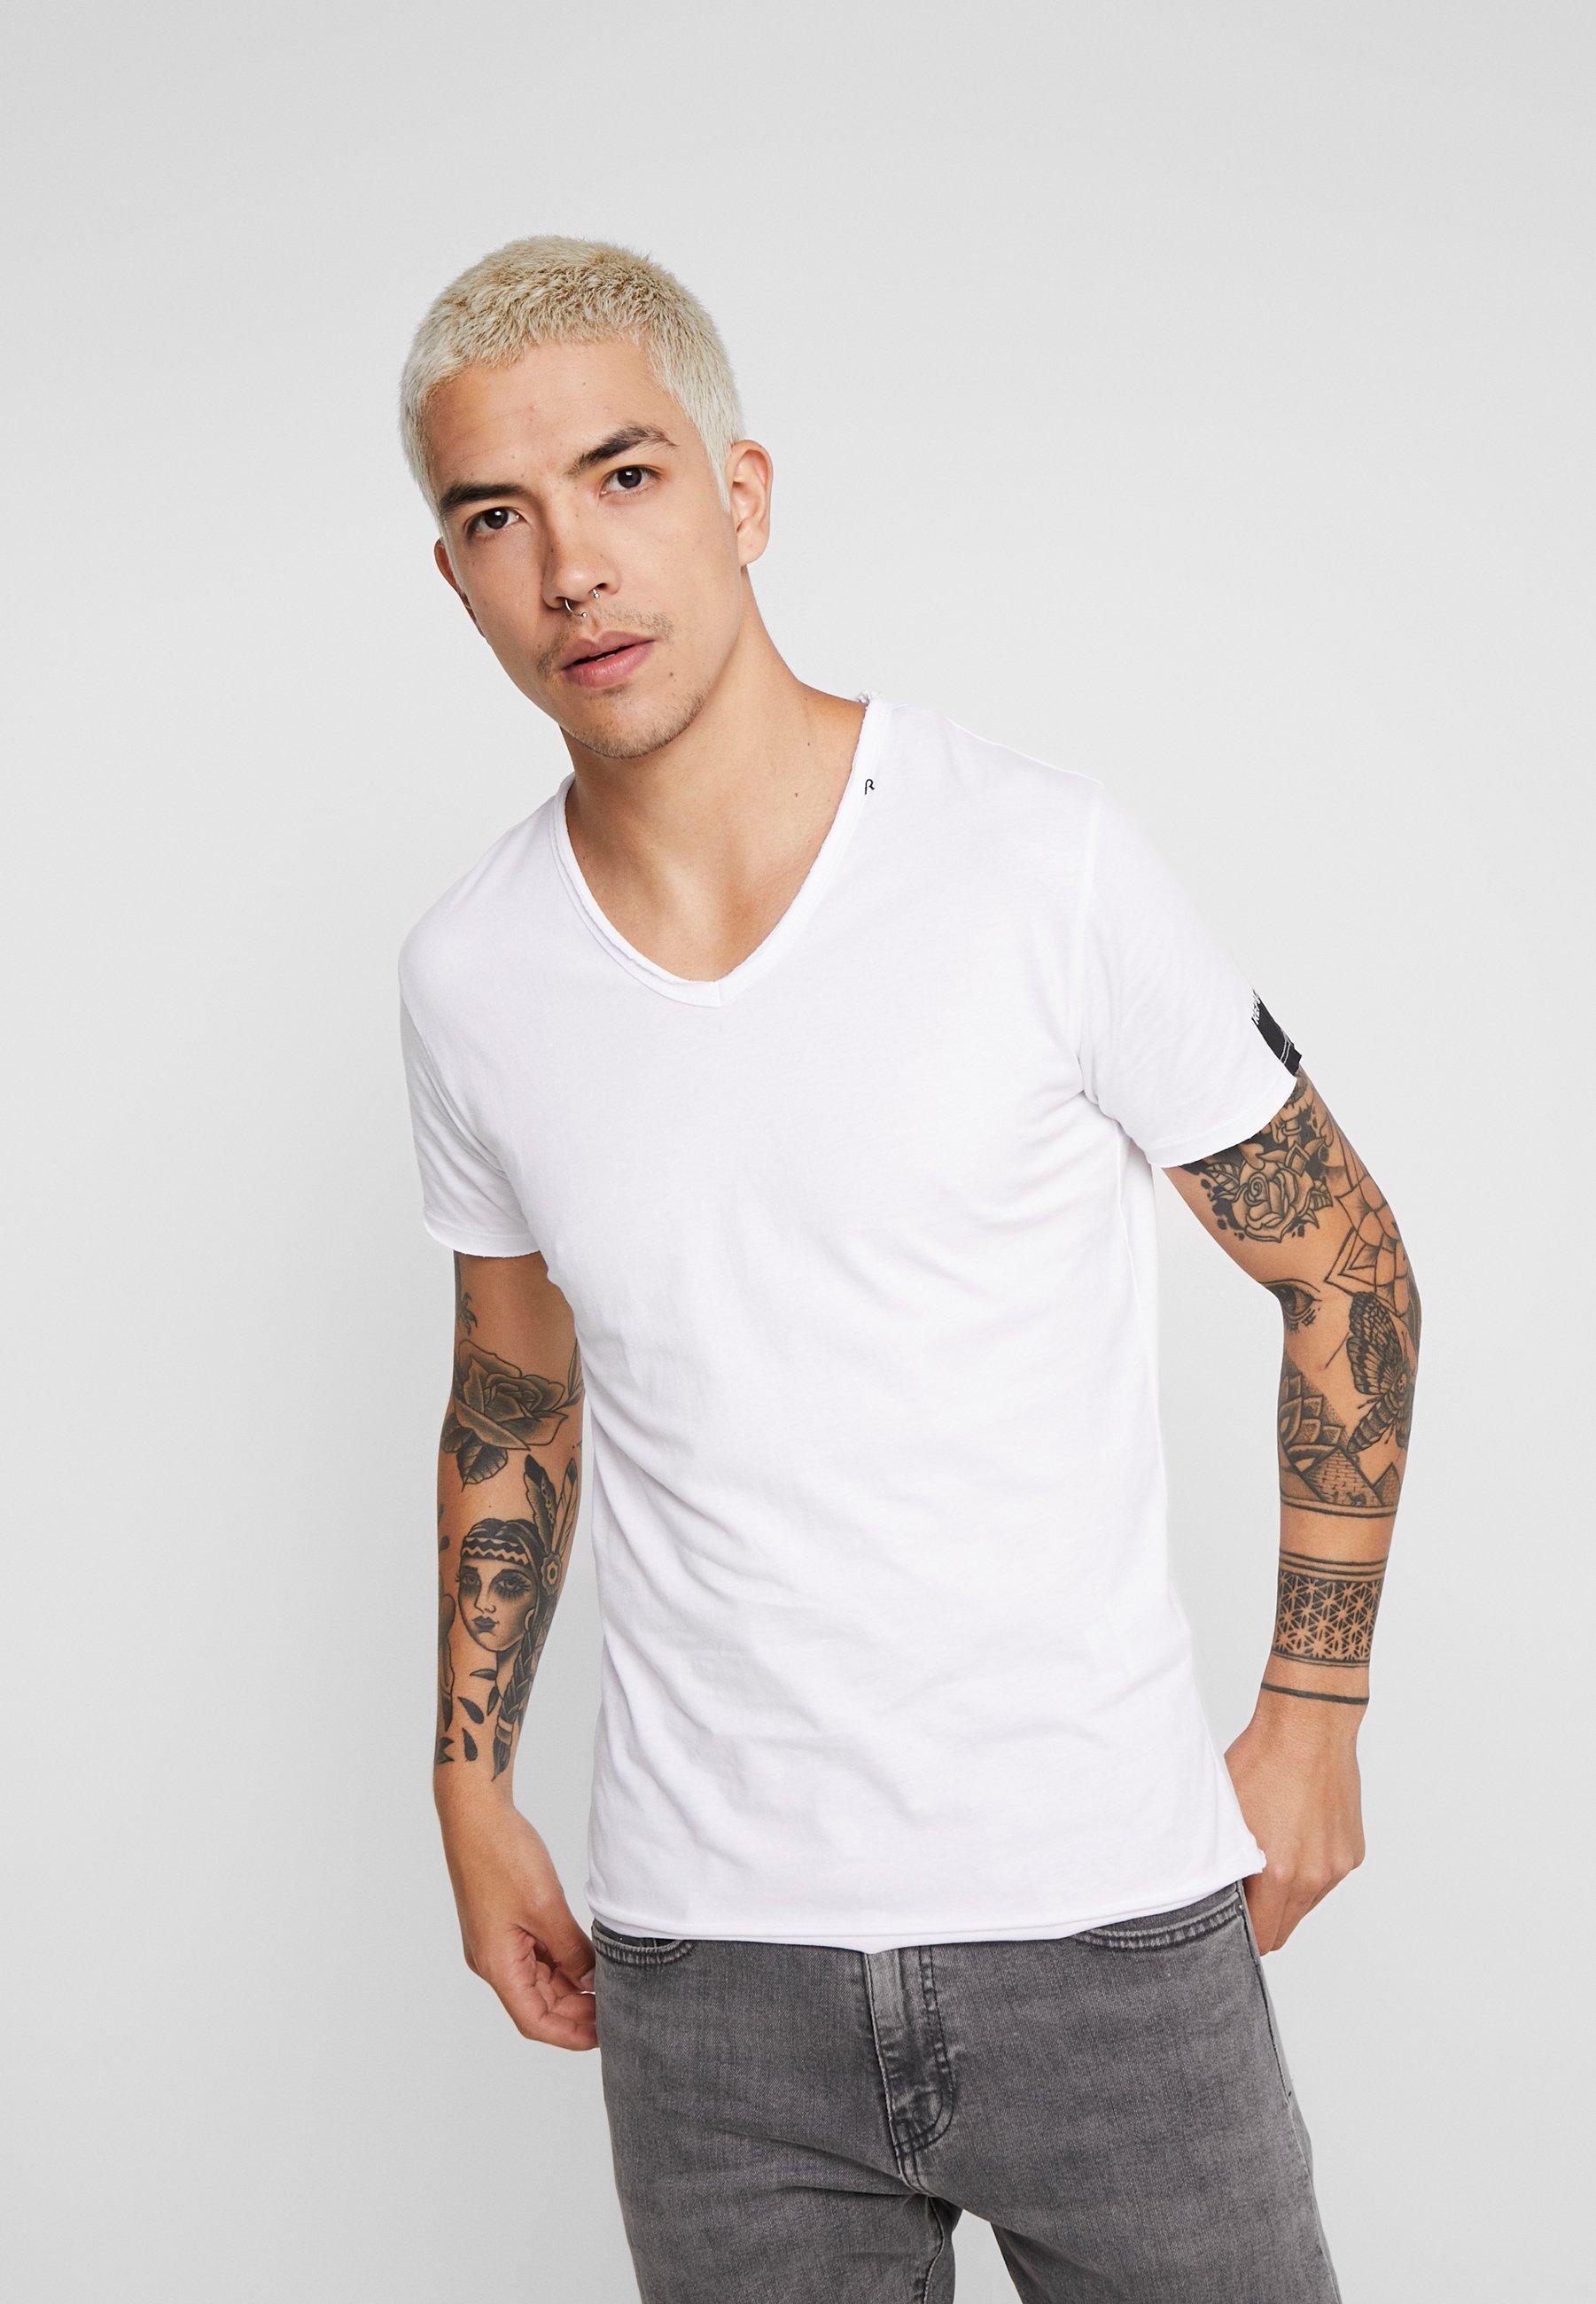 T shirt shirt T BasiqueWhite Replay BasiqueWhite Replay Replay vmNn80wO